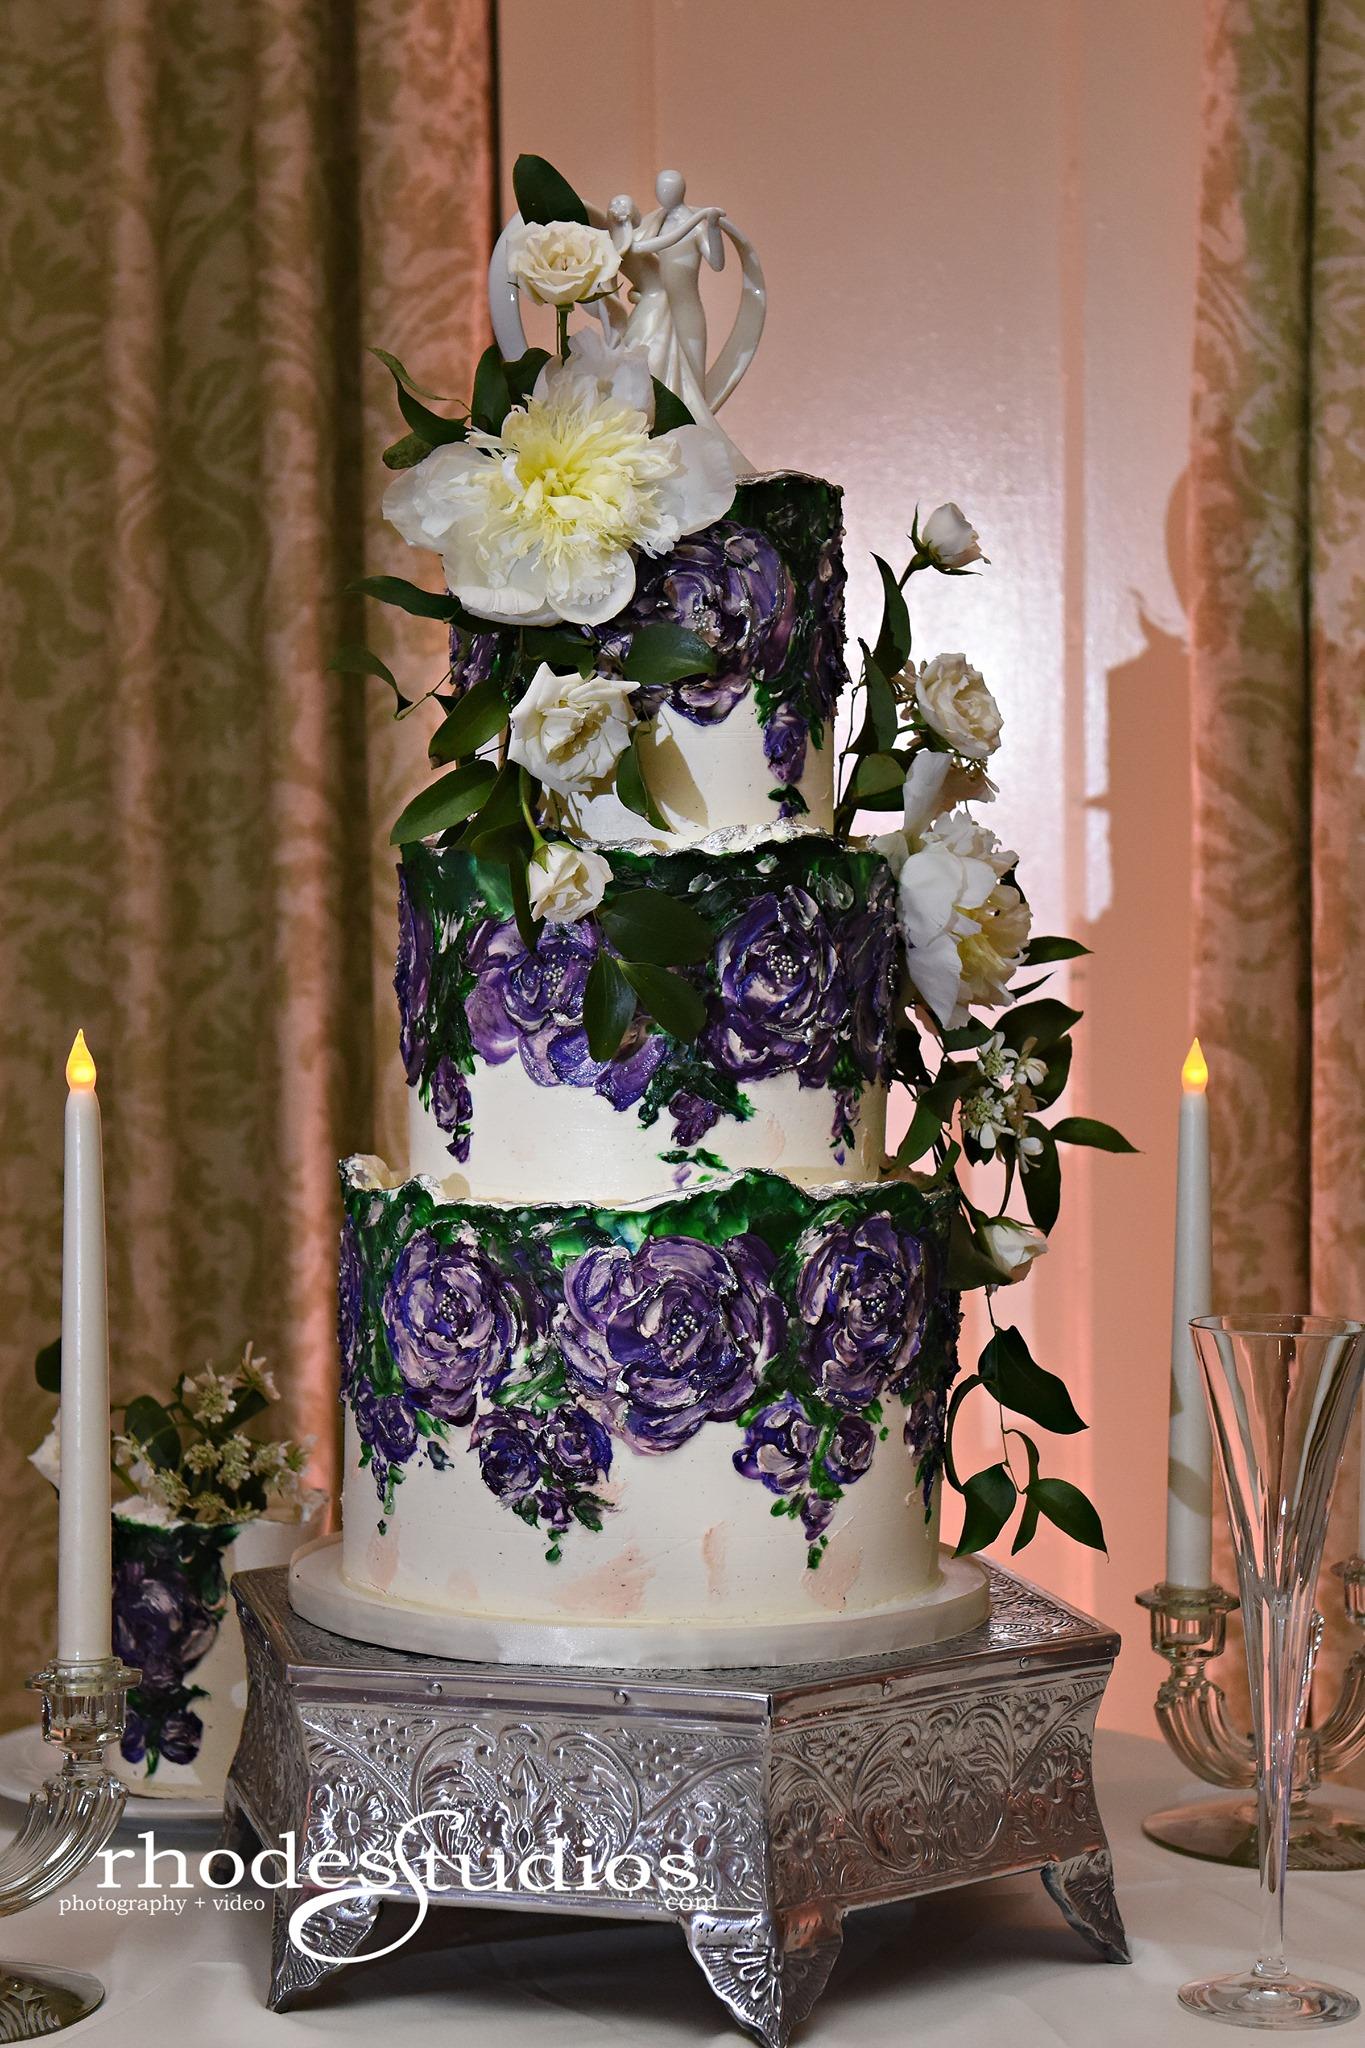 Soundwave Interlachen Country Club Central Florida Wedding First DanceSoundwave Interlachen Country Club Central Florida Wedding Cake